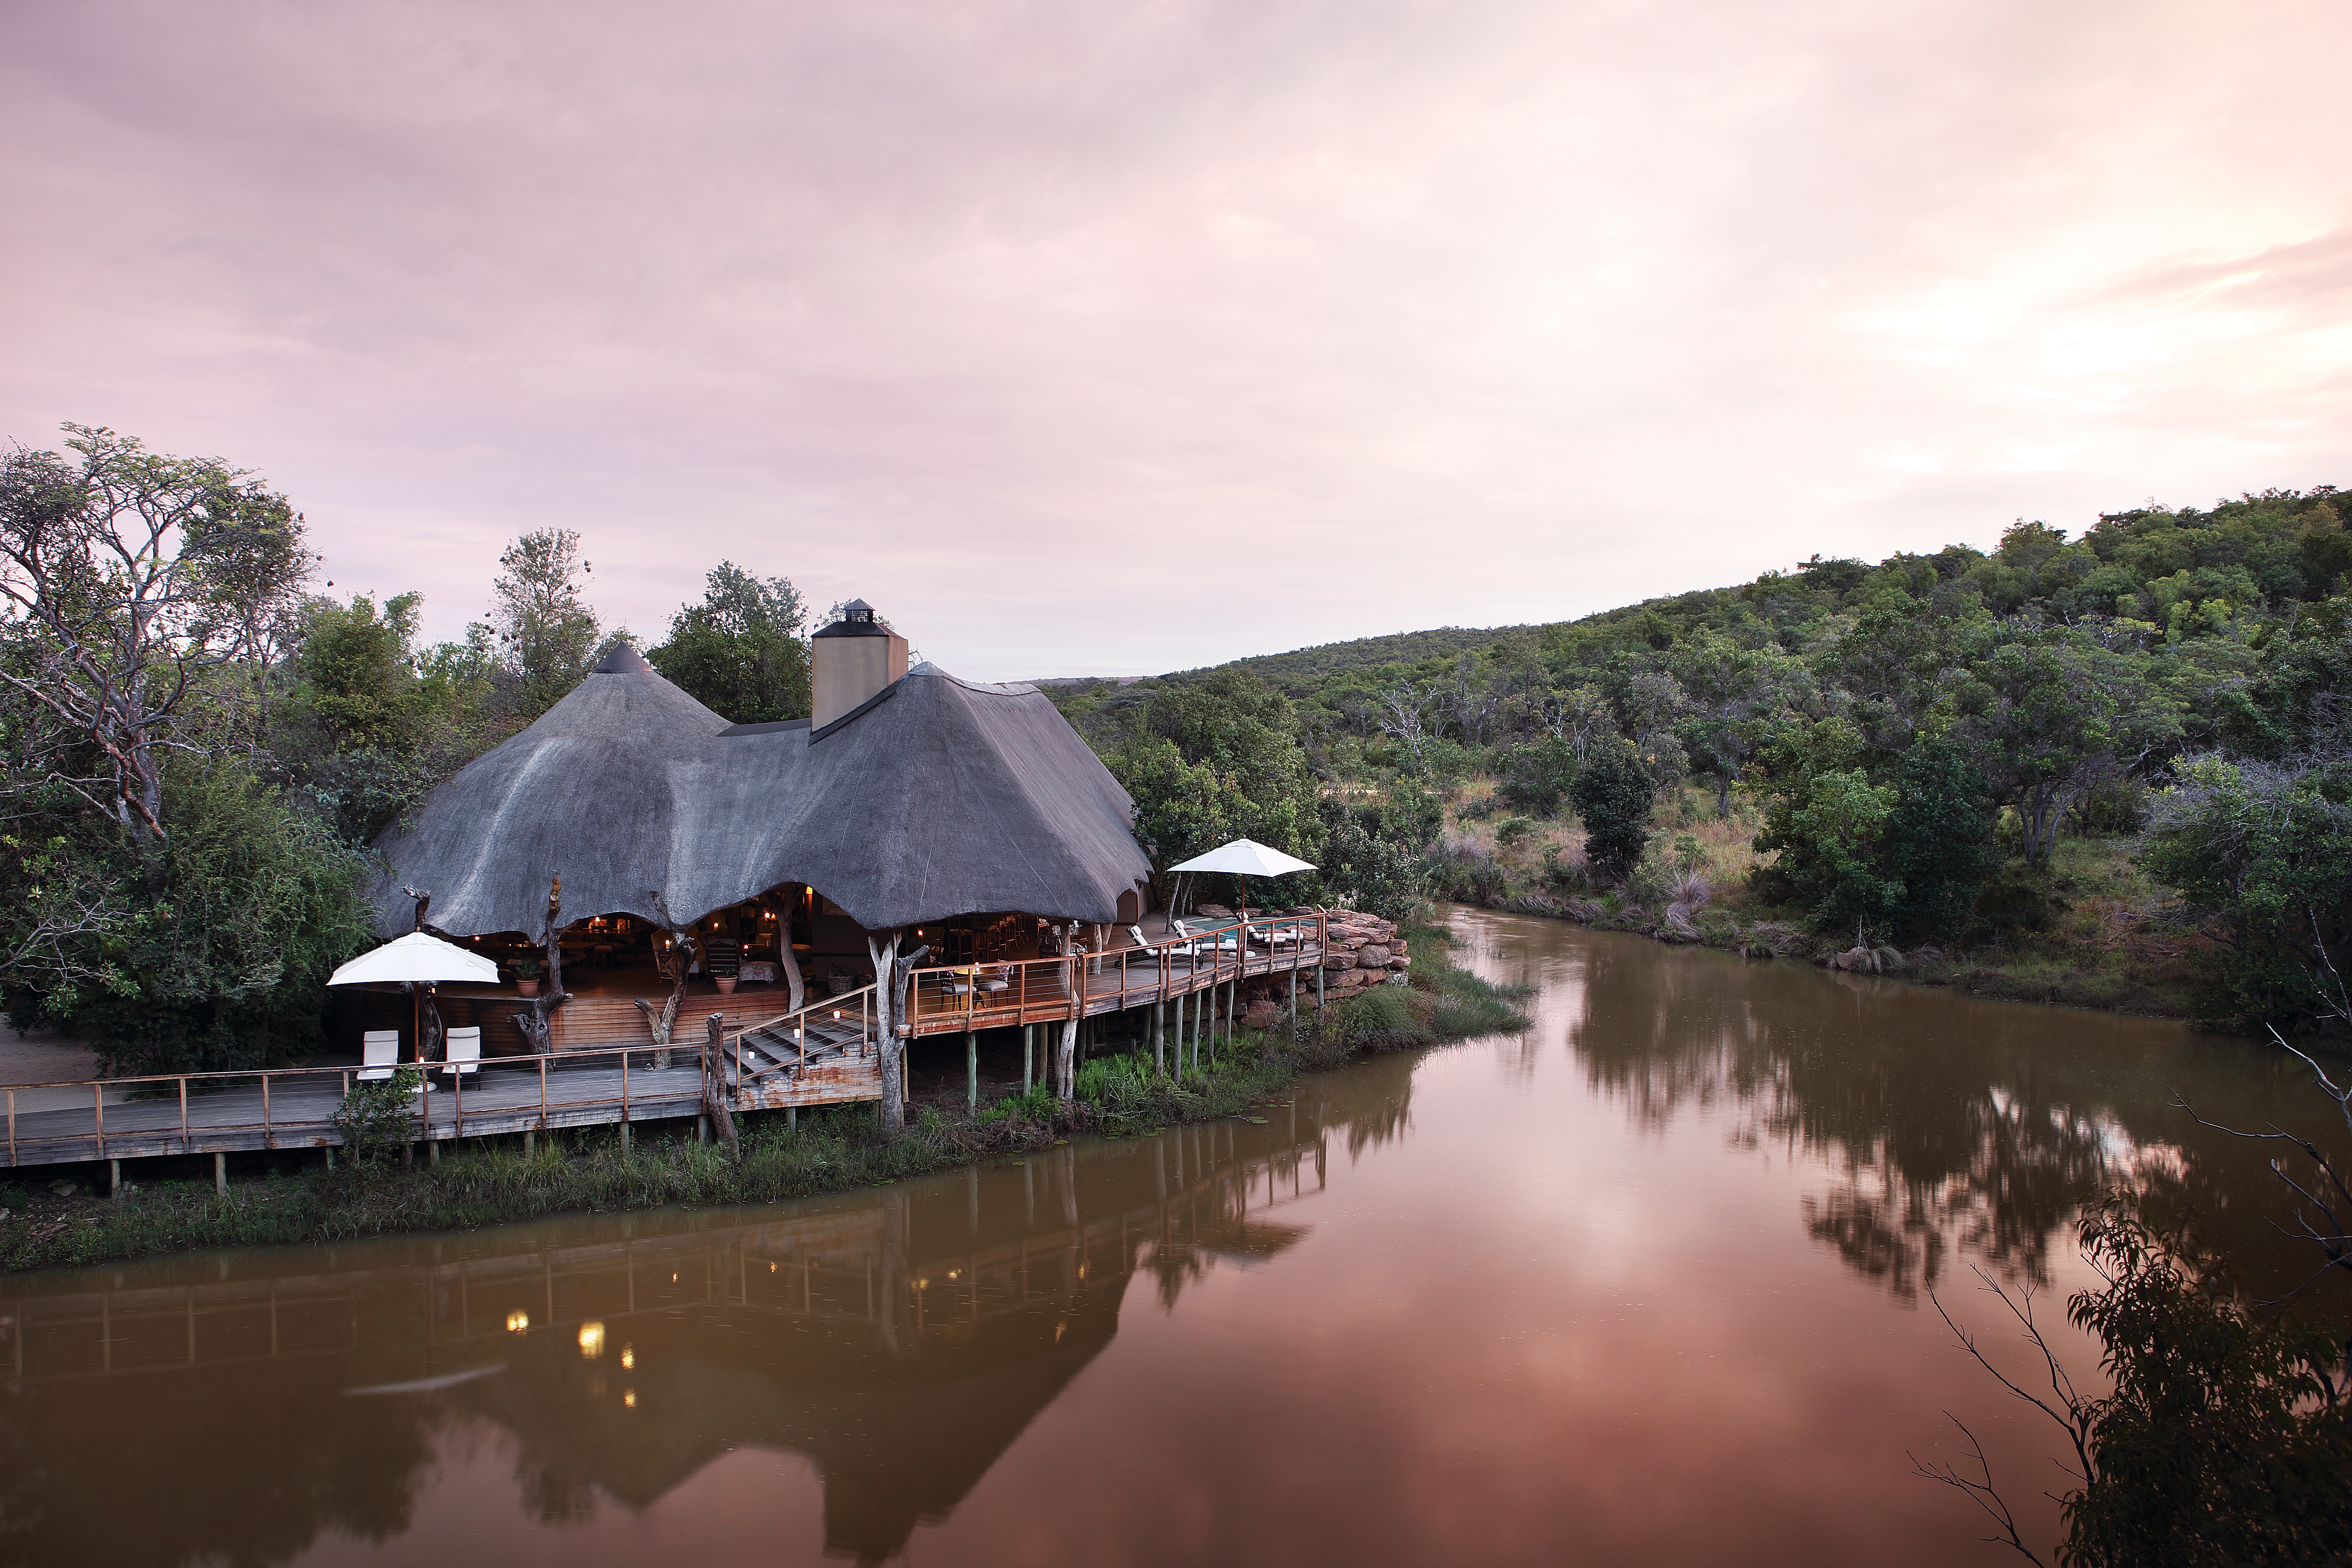 Shambala Zulu Camp & Private Safari Lodge, Waterberg